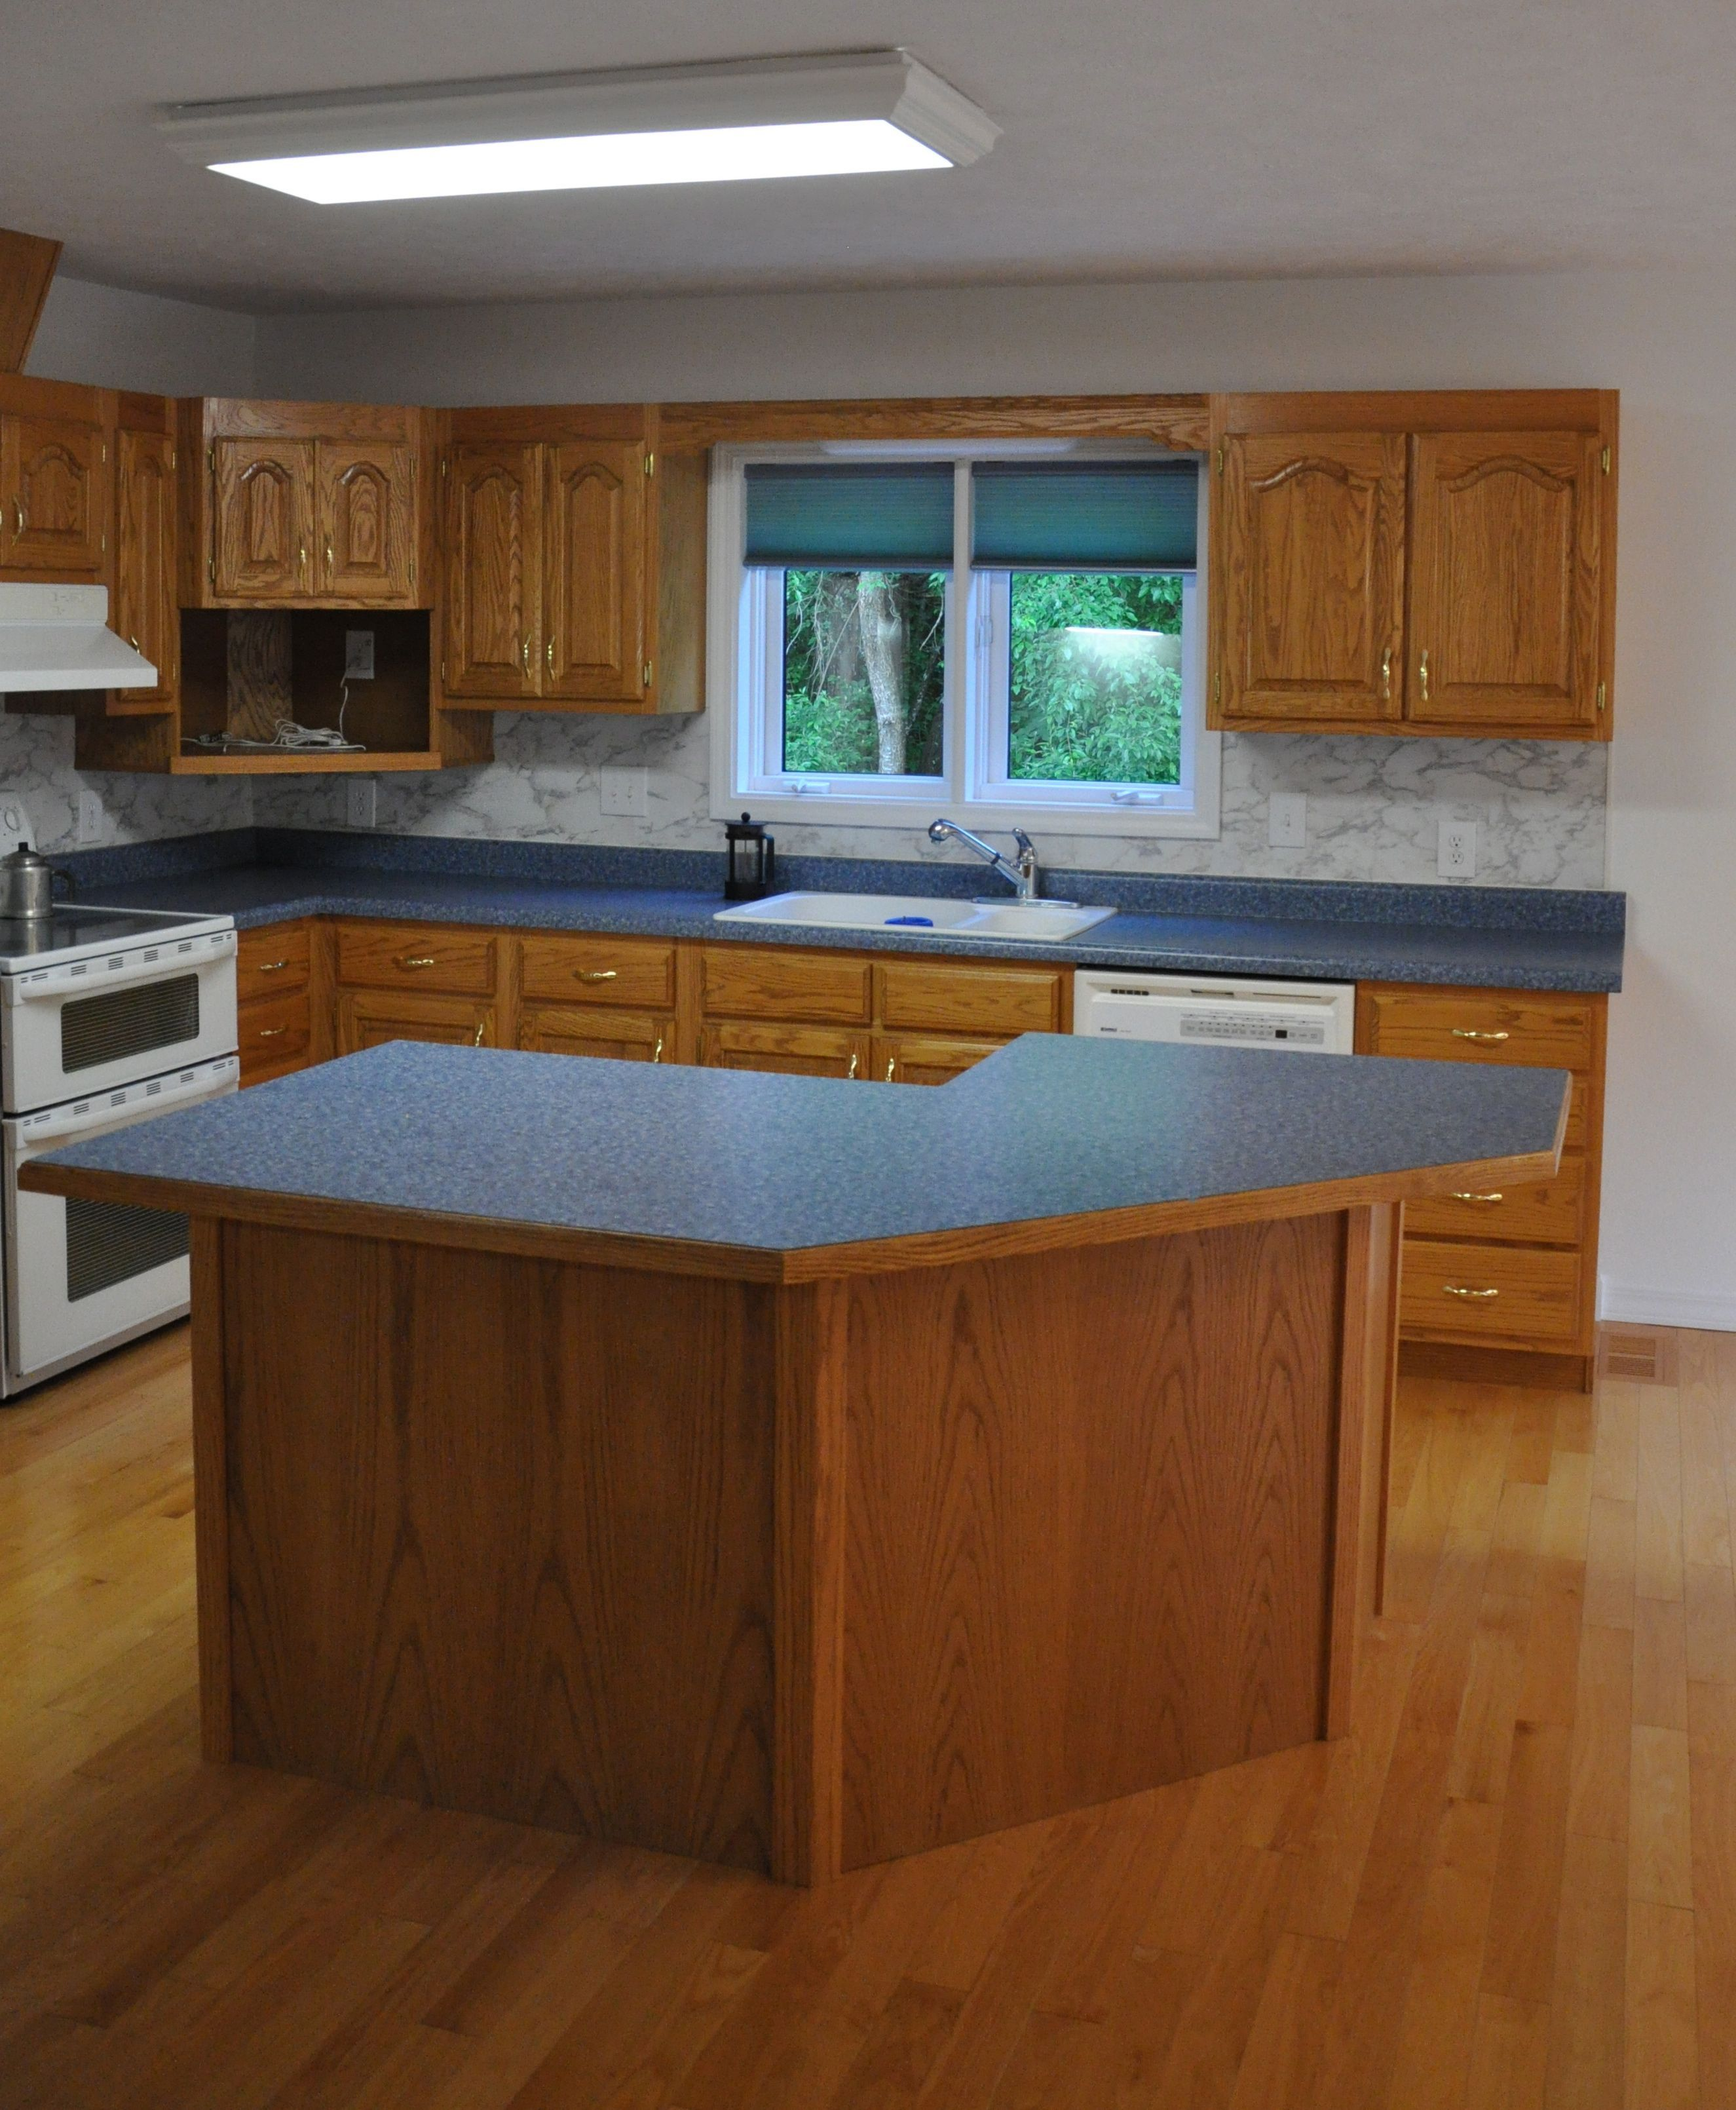 Golden Oak Kitchen Blue Formica, white walls